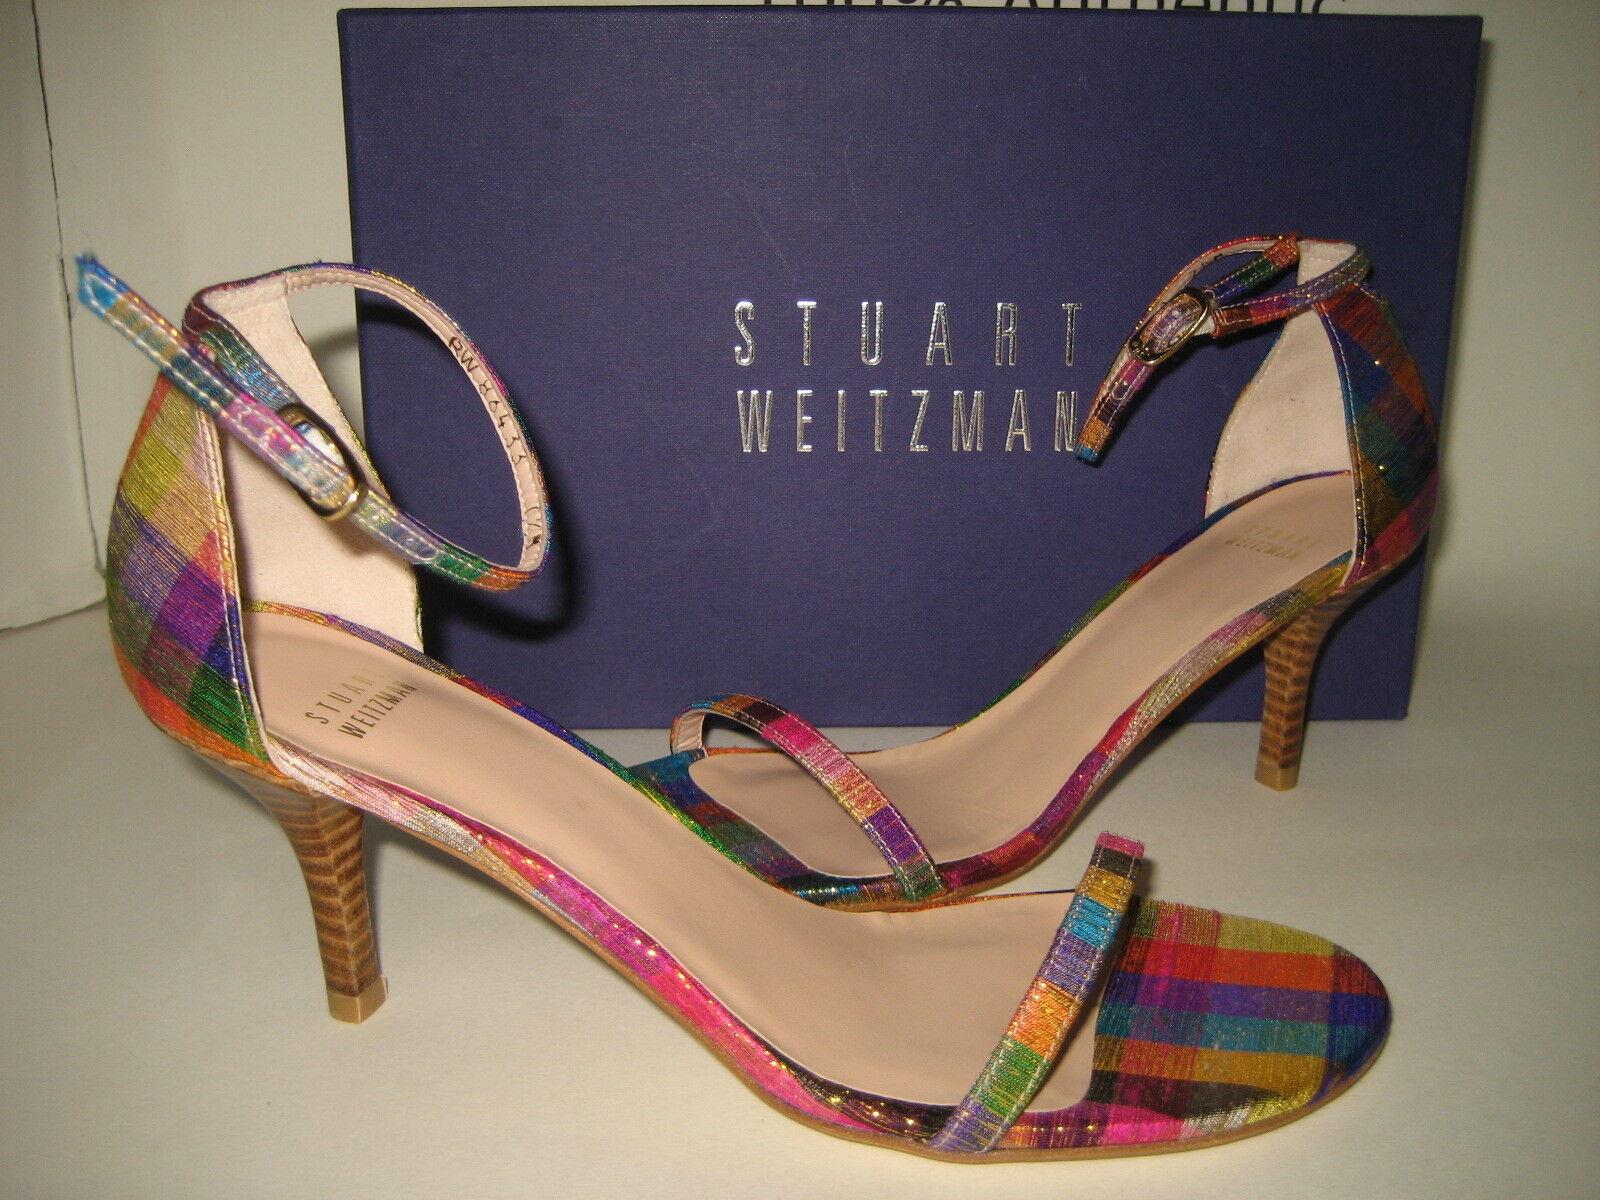 398 Nueva Bx Stuart Stuart Stuart Weitzman Naked oropel Seda Sandalias Us 7.5 alto 3  Tacones Zapatos  Entrega directa y rápida de fábrica